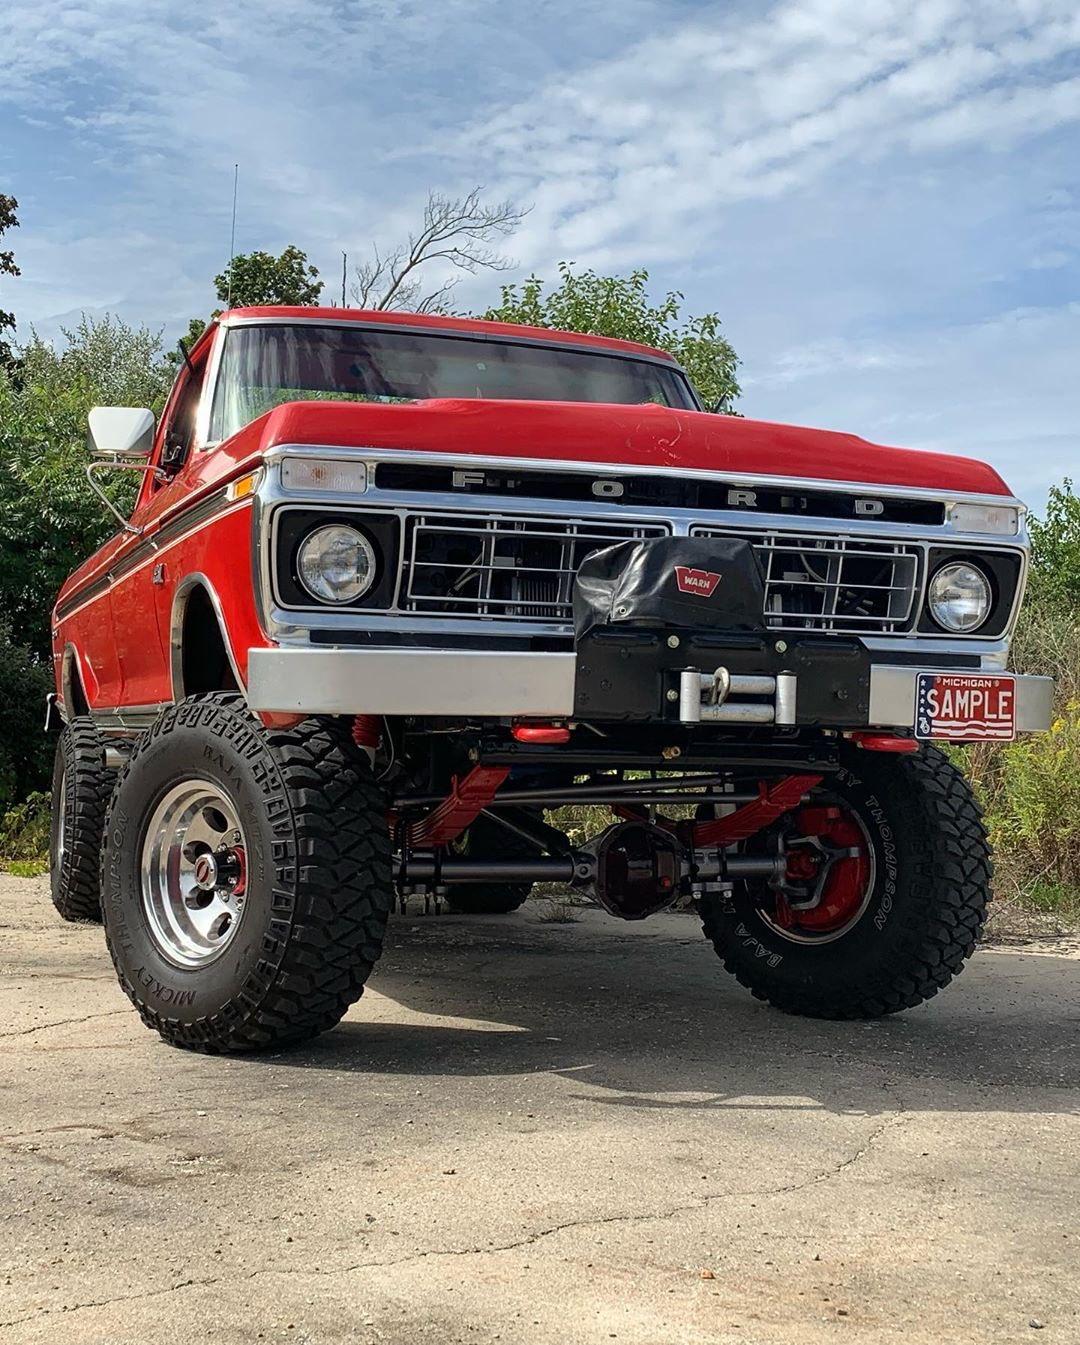 18 Year Old Built His Dream Truck 1976 Ford F250 Highboy 7.jpg